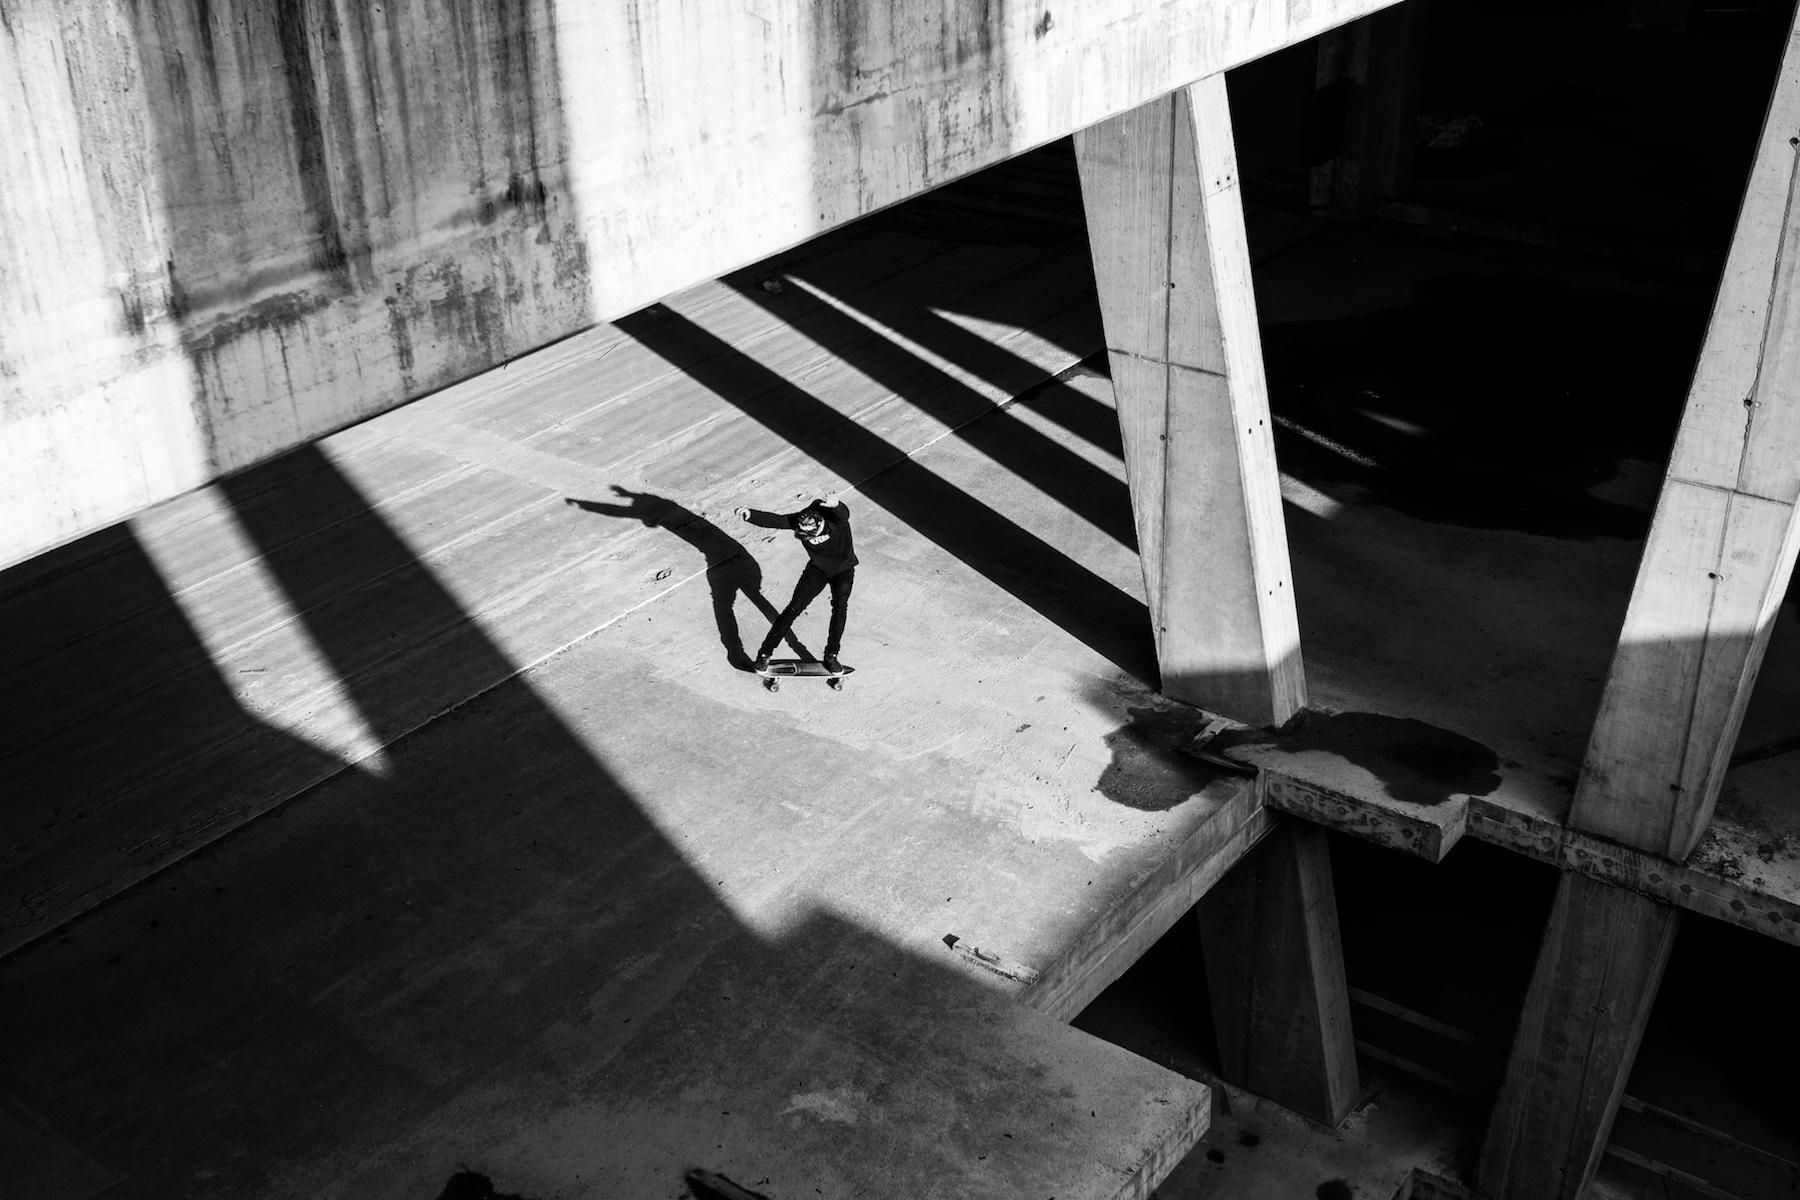 luke-paige-skate-photography-11